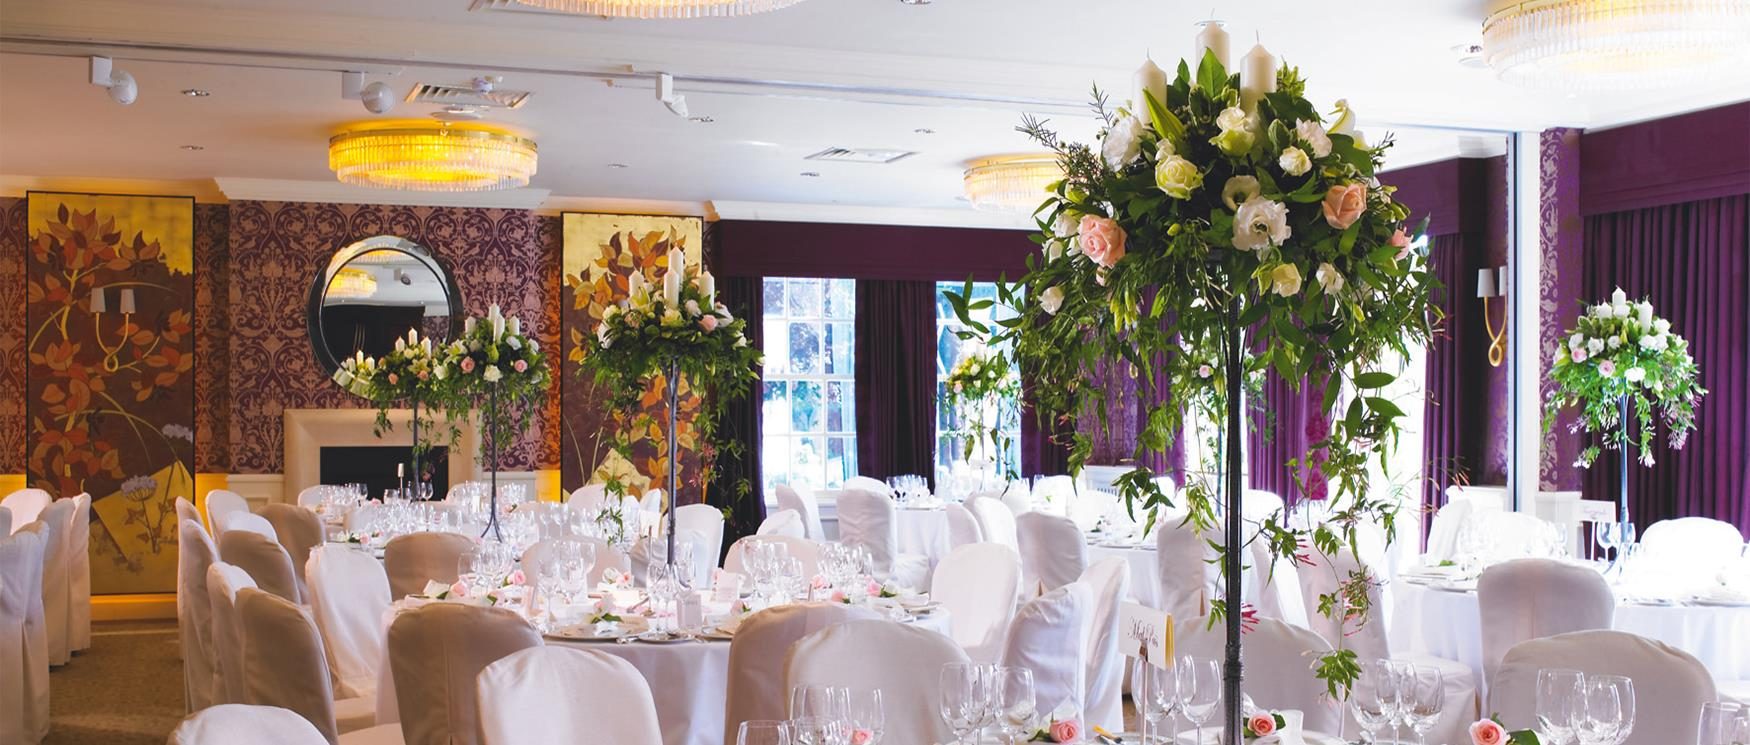 Weddings Wedding Venues In Hampshire Visit Hampshire